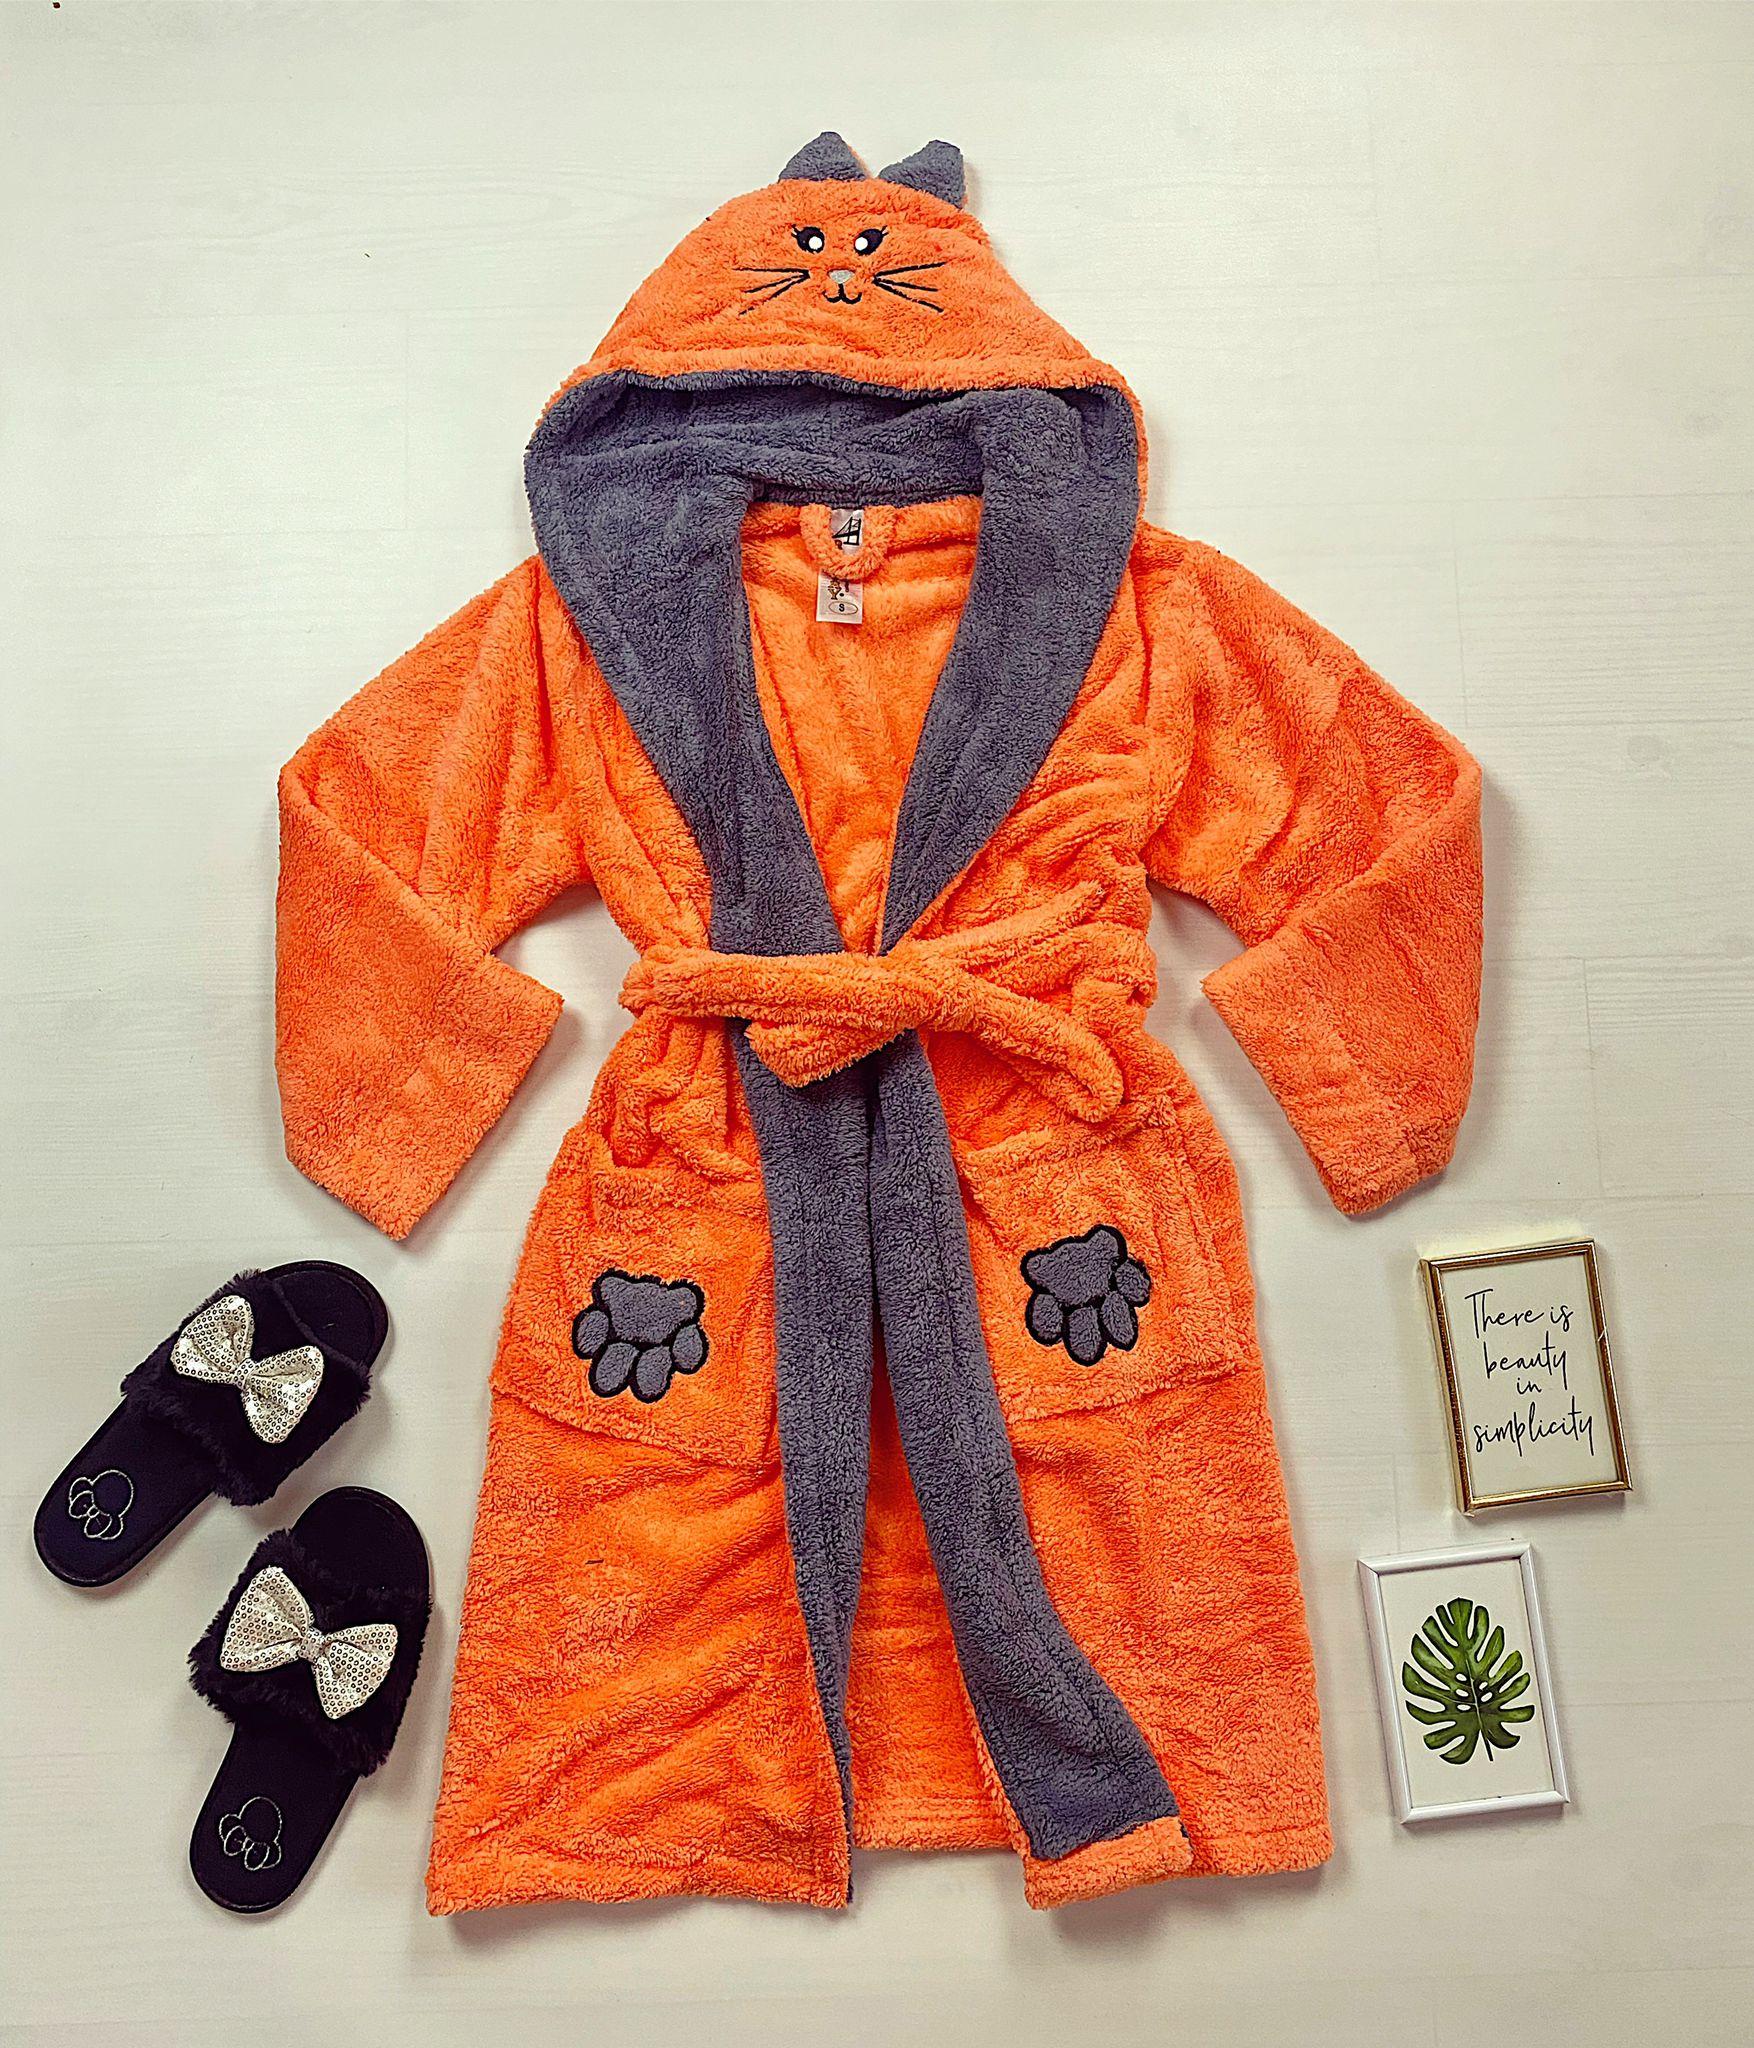 Halat dama portocaliu pufos cu gluga Bunny